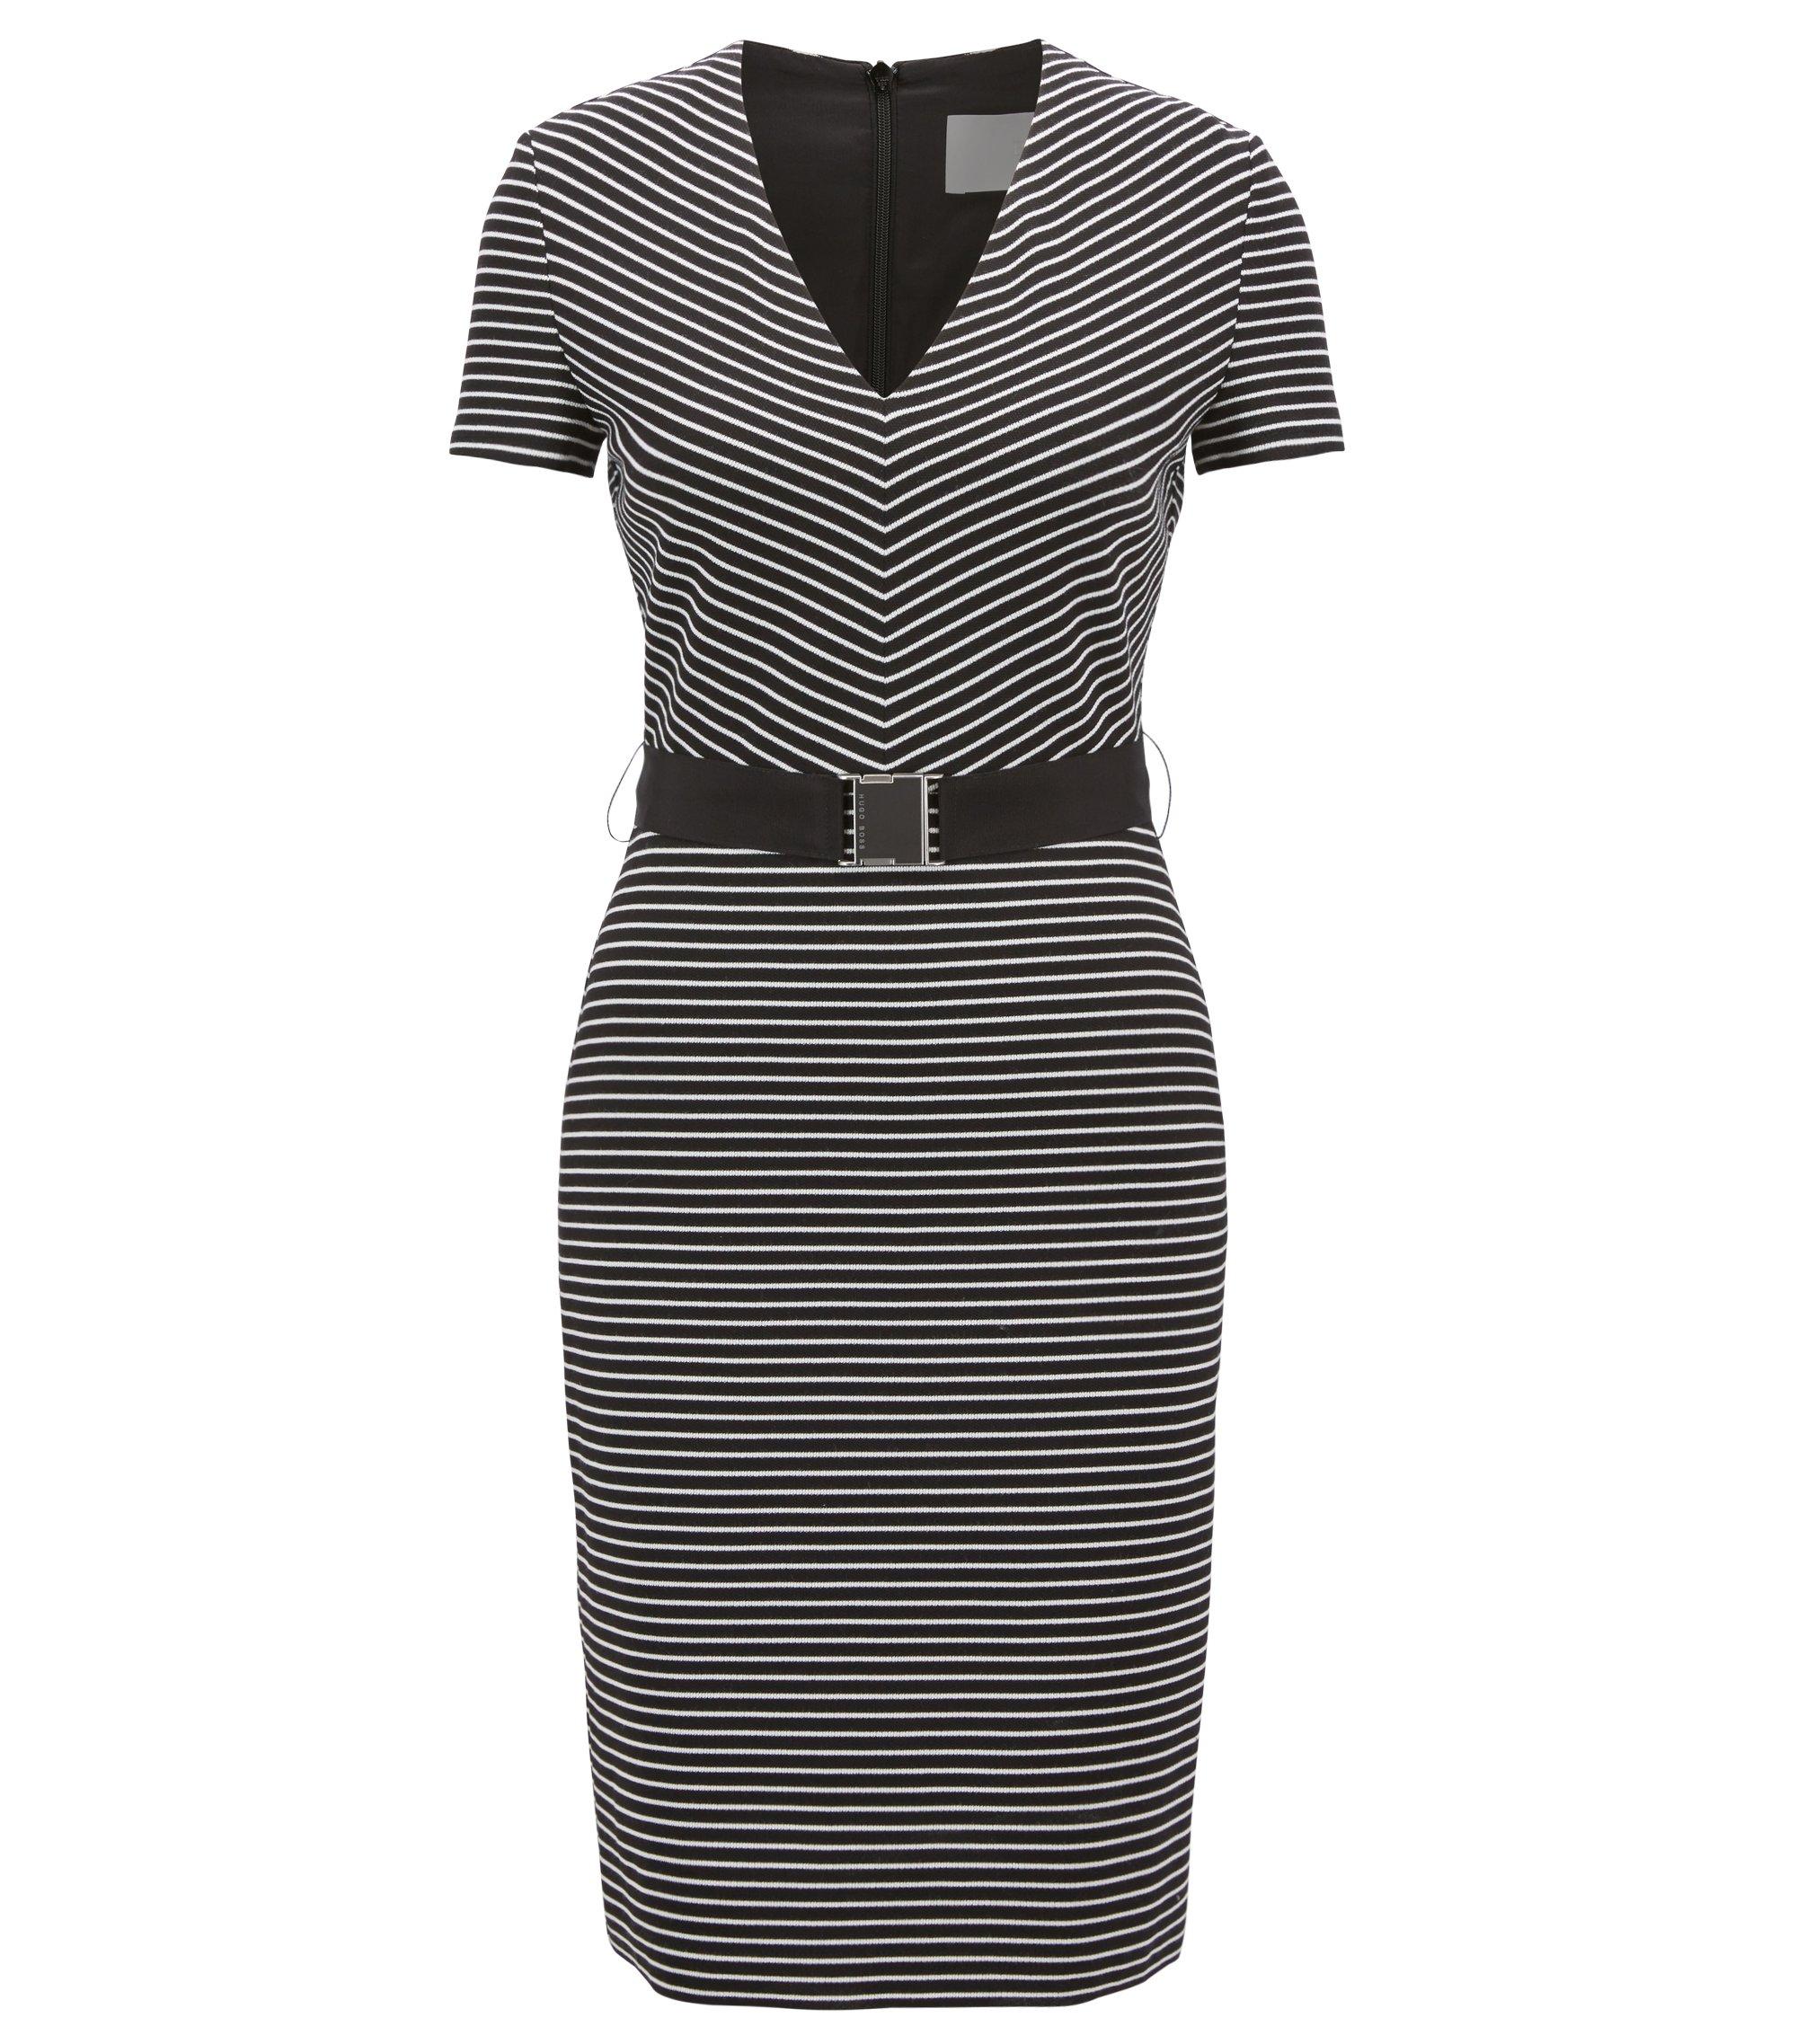 V-neck striped dress in a cotton blend, Patterned